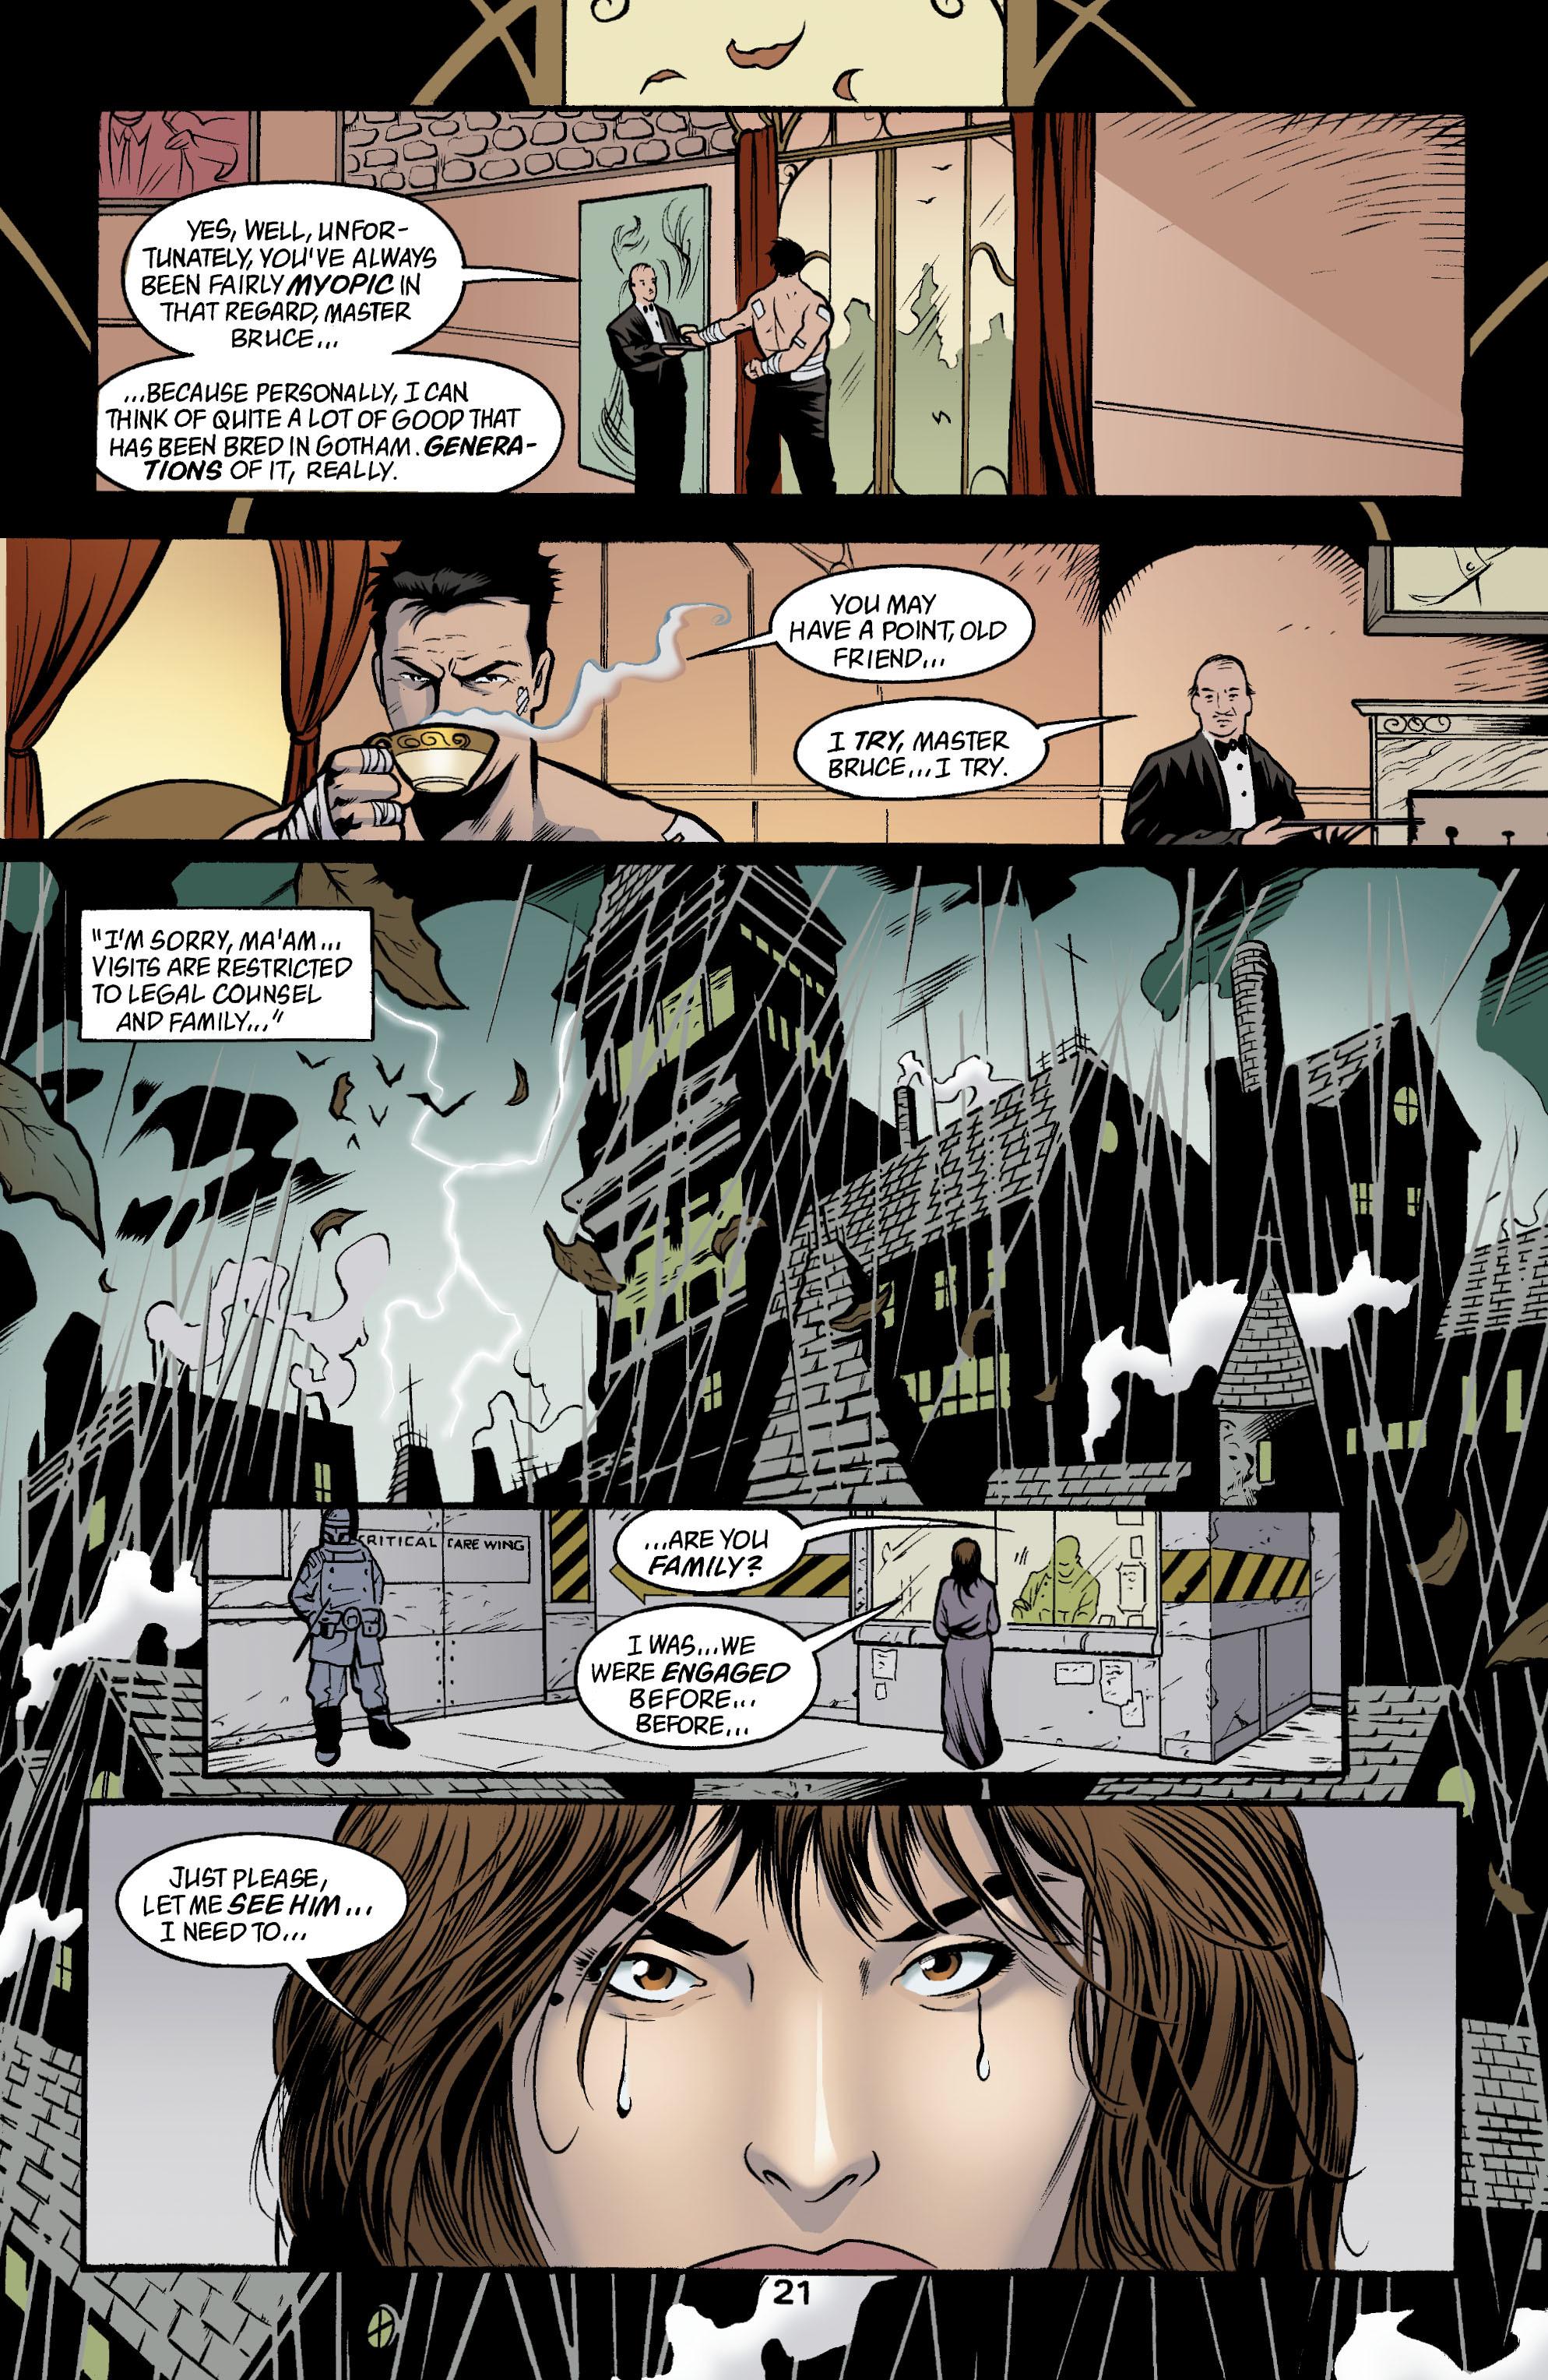 Detective Comics (1937) 782 Page 21